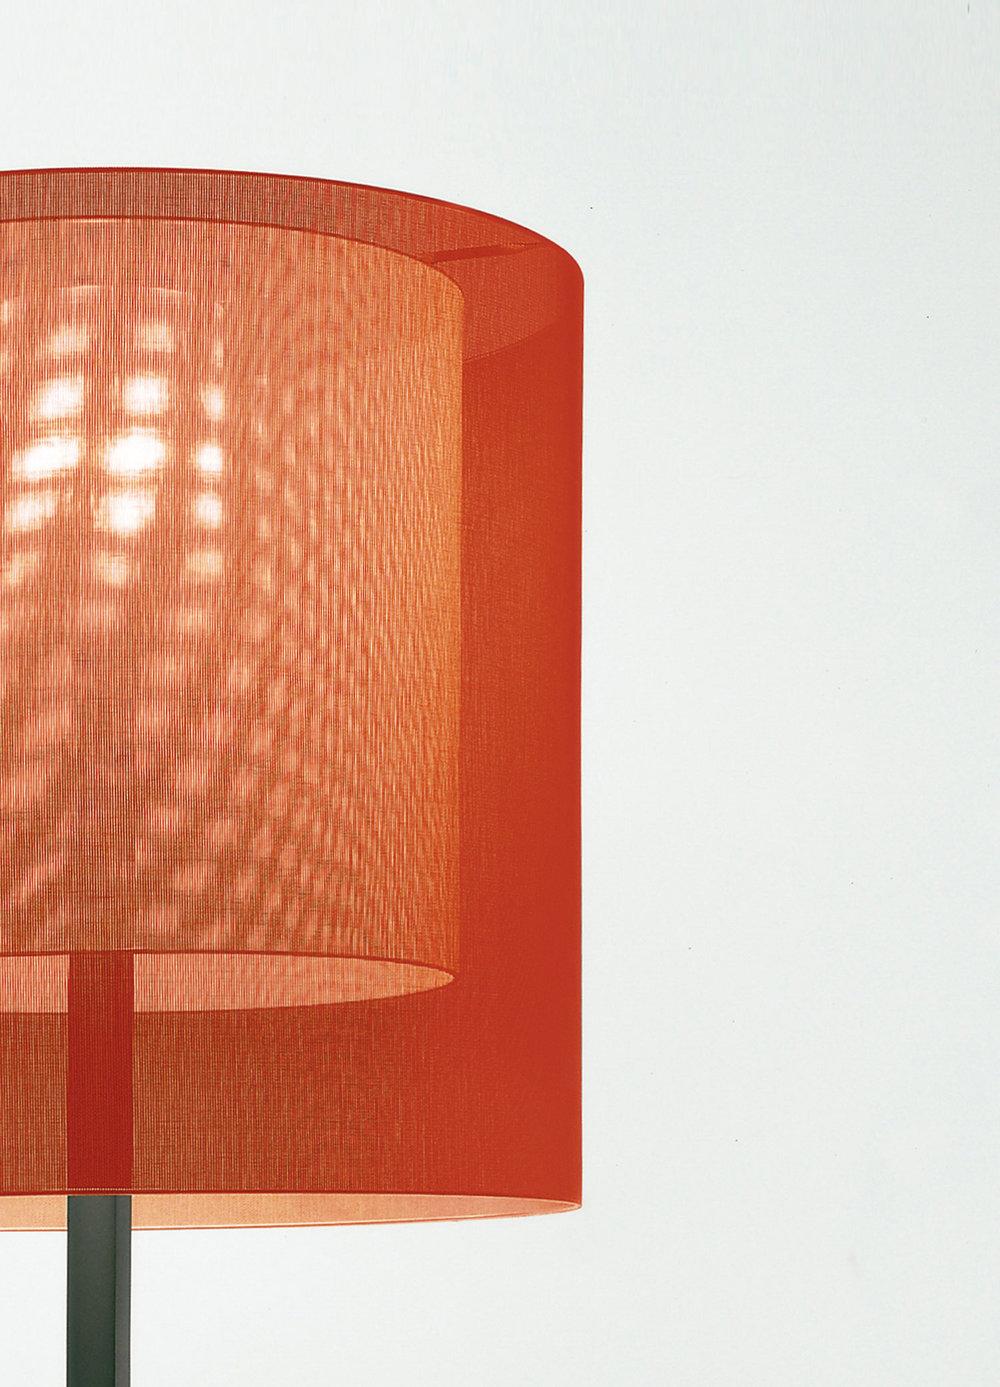 SANTACOLE_FLOOR_LAMPS_Moare_Masia__Carme_12-web.jpg